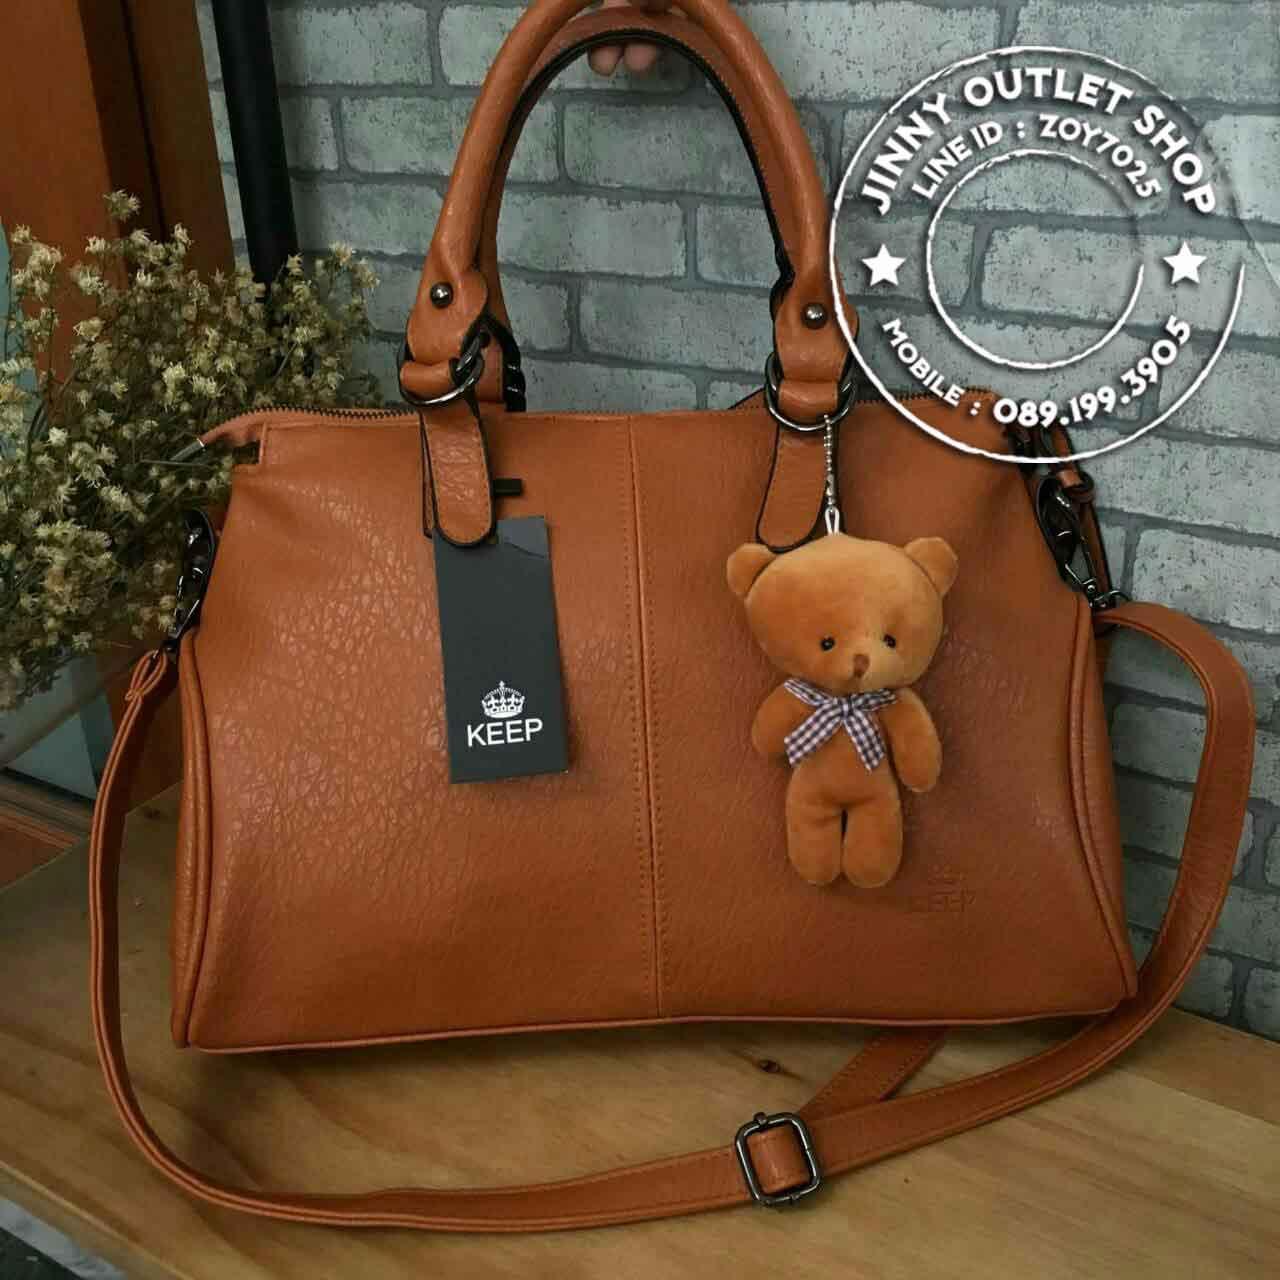 KEEP ( Parish Hand Bag With Bear )